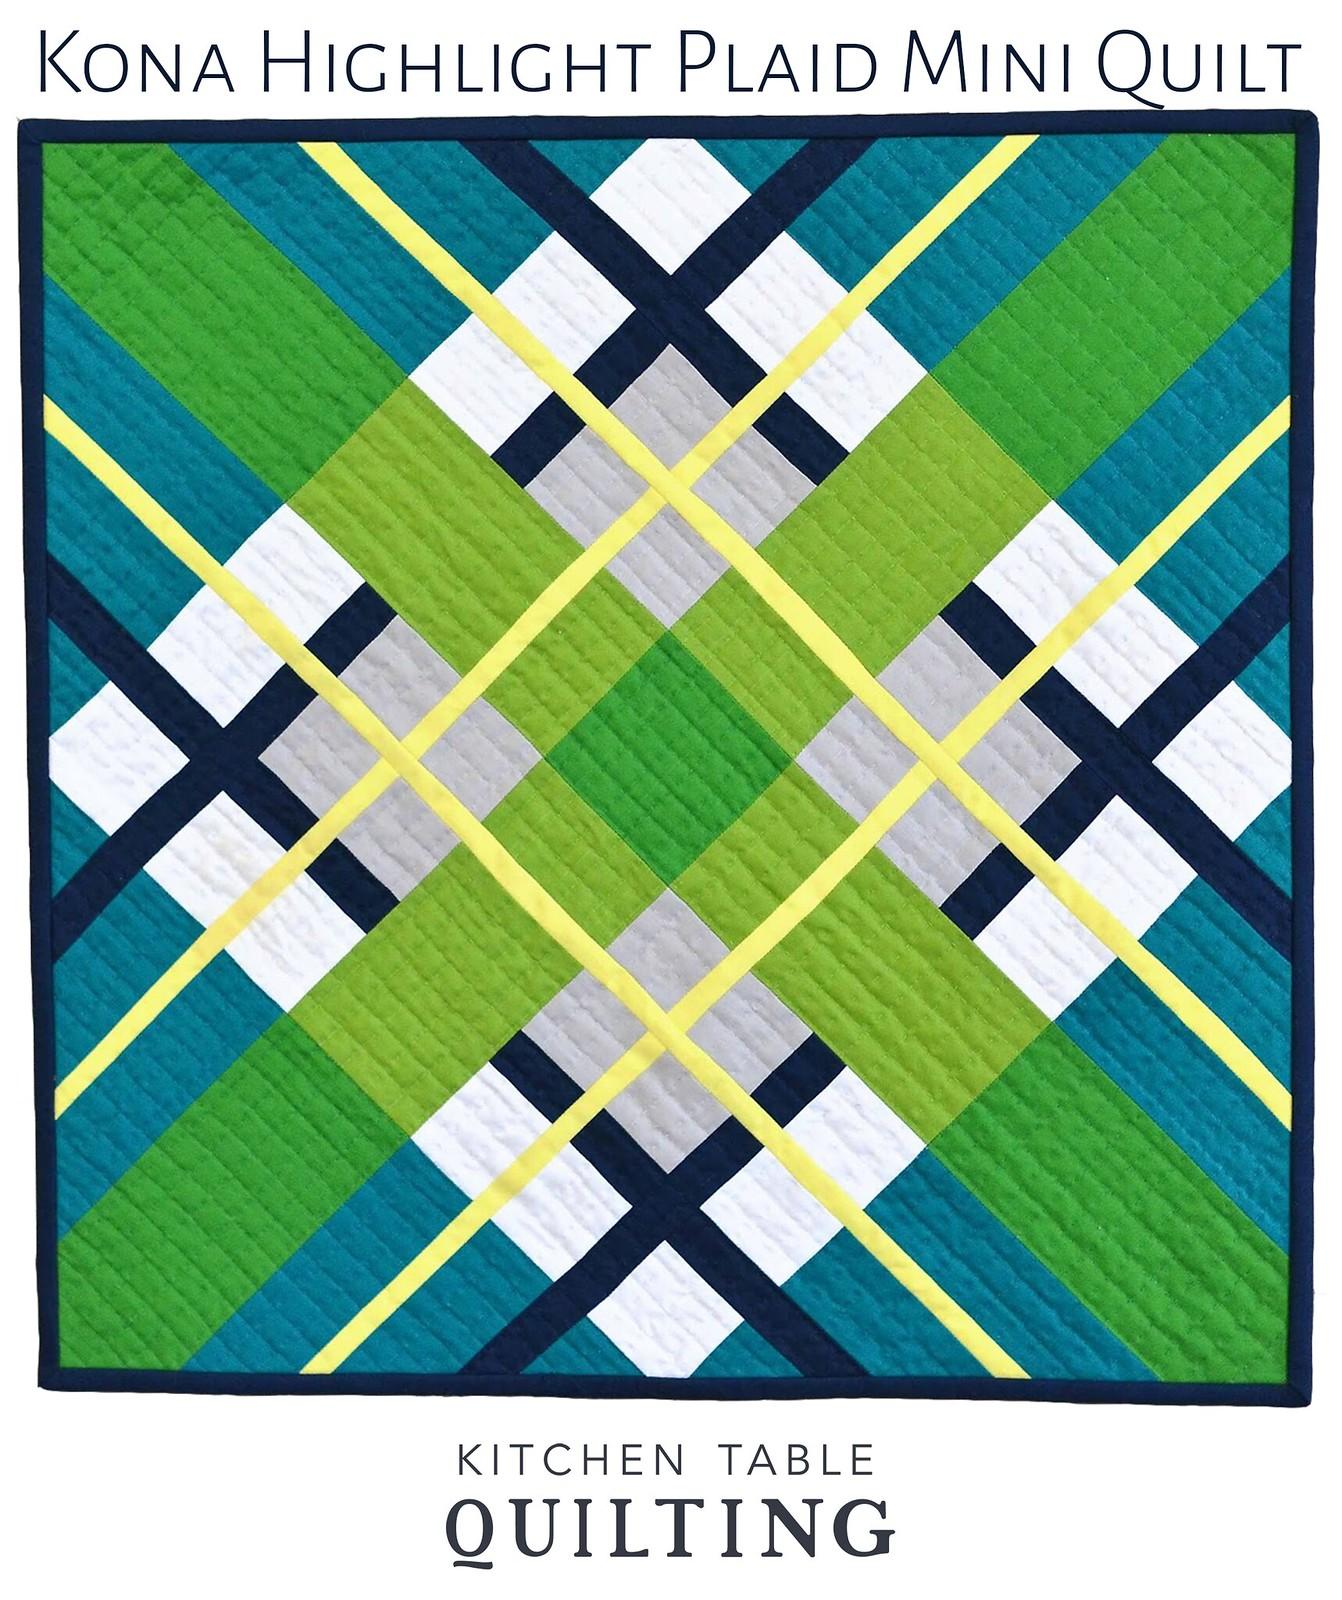 Kona Highlight Plaid Mini Quilt